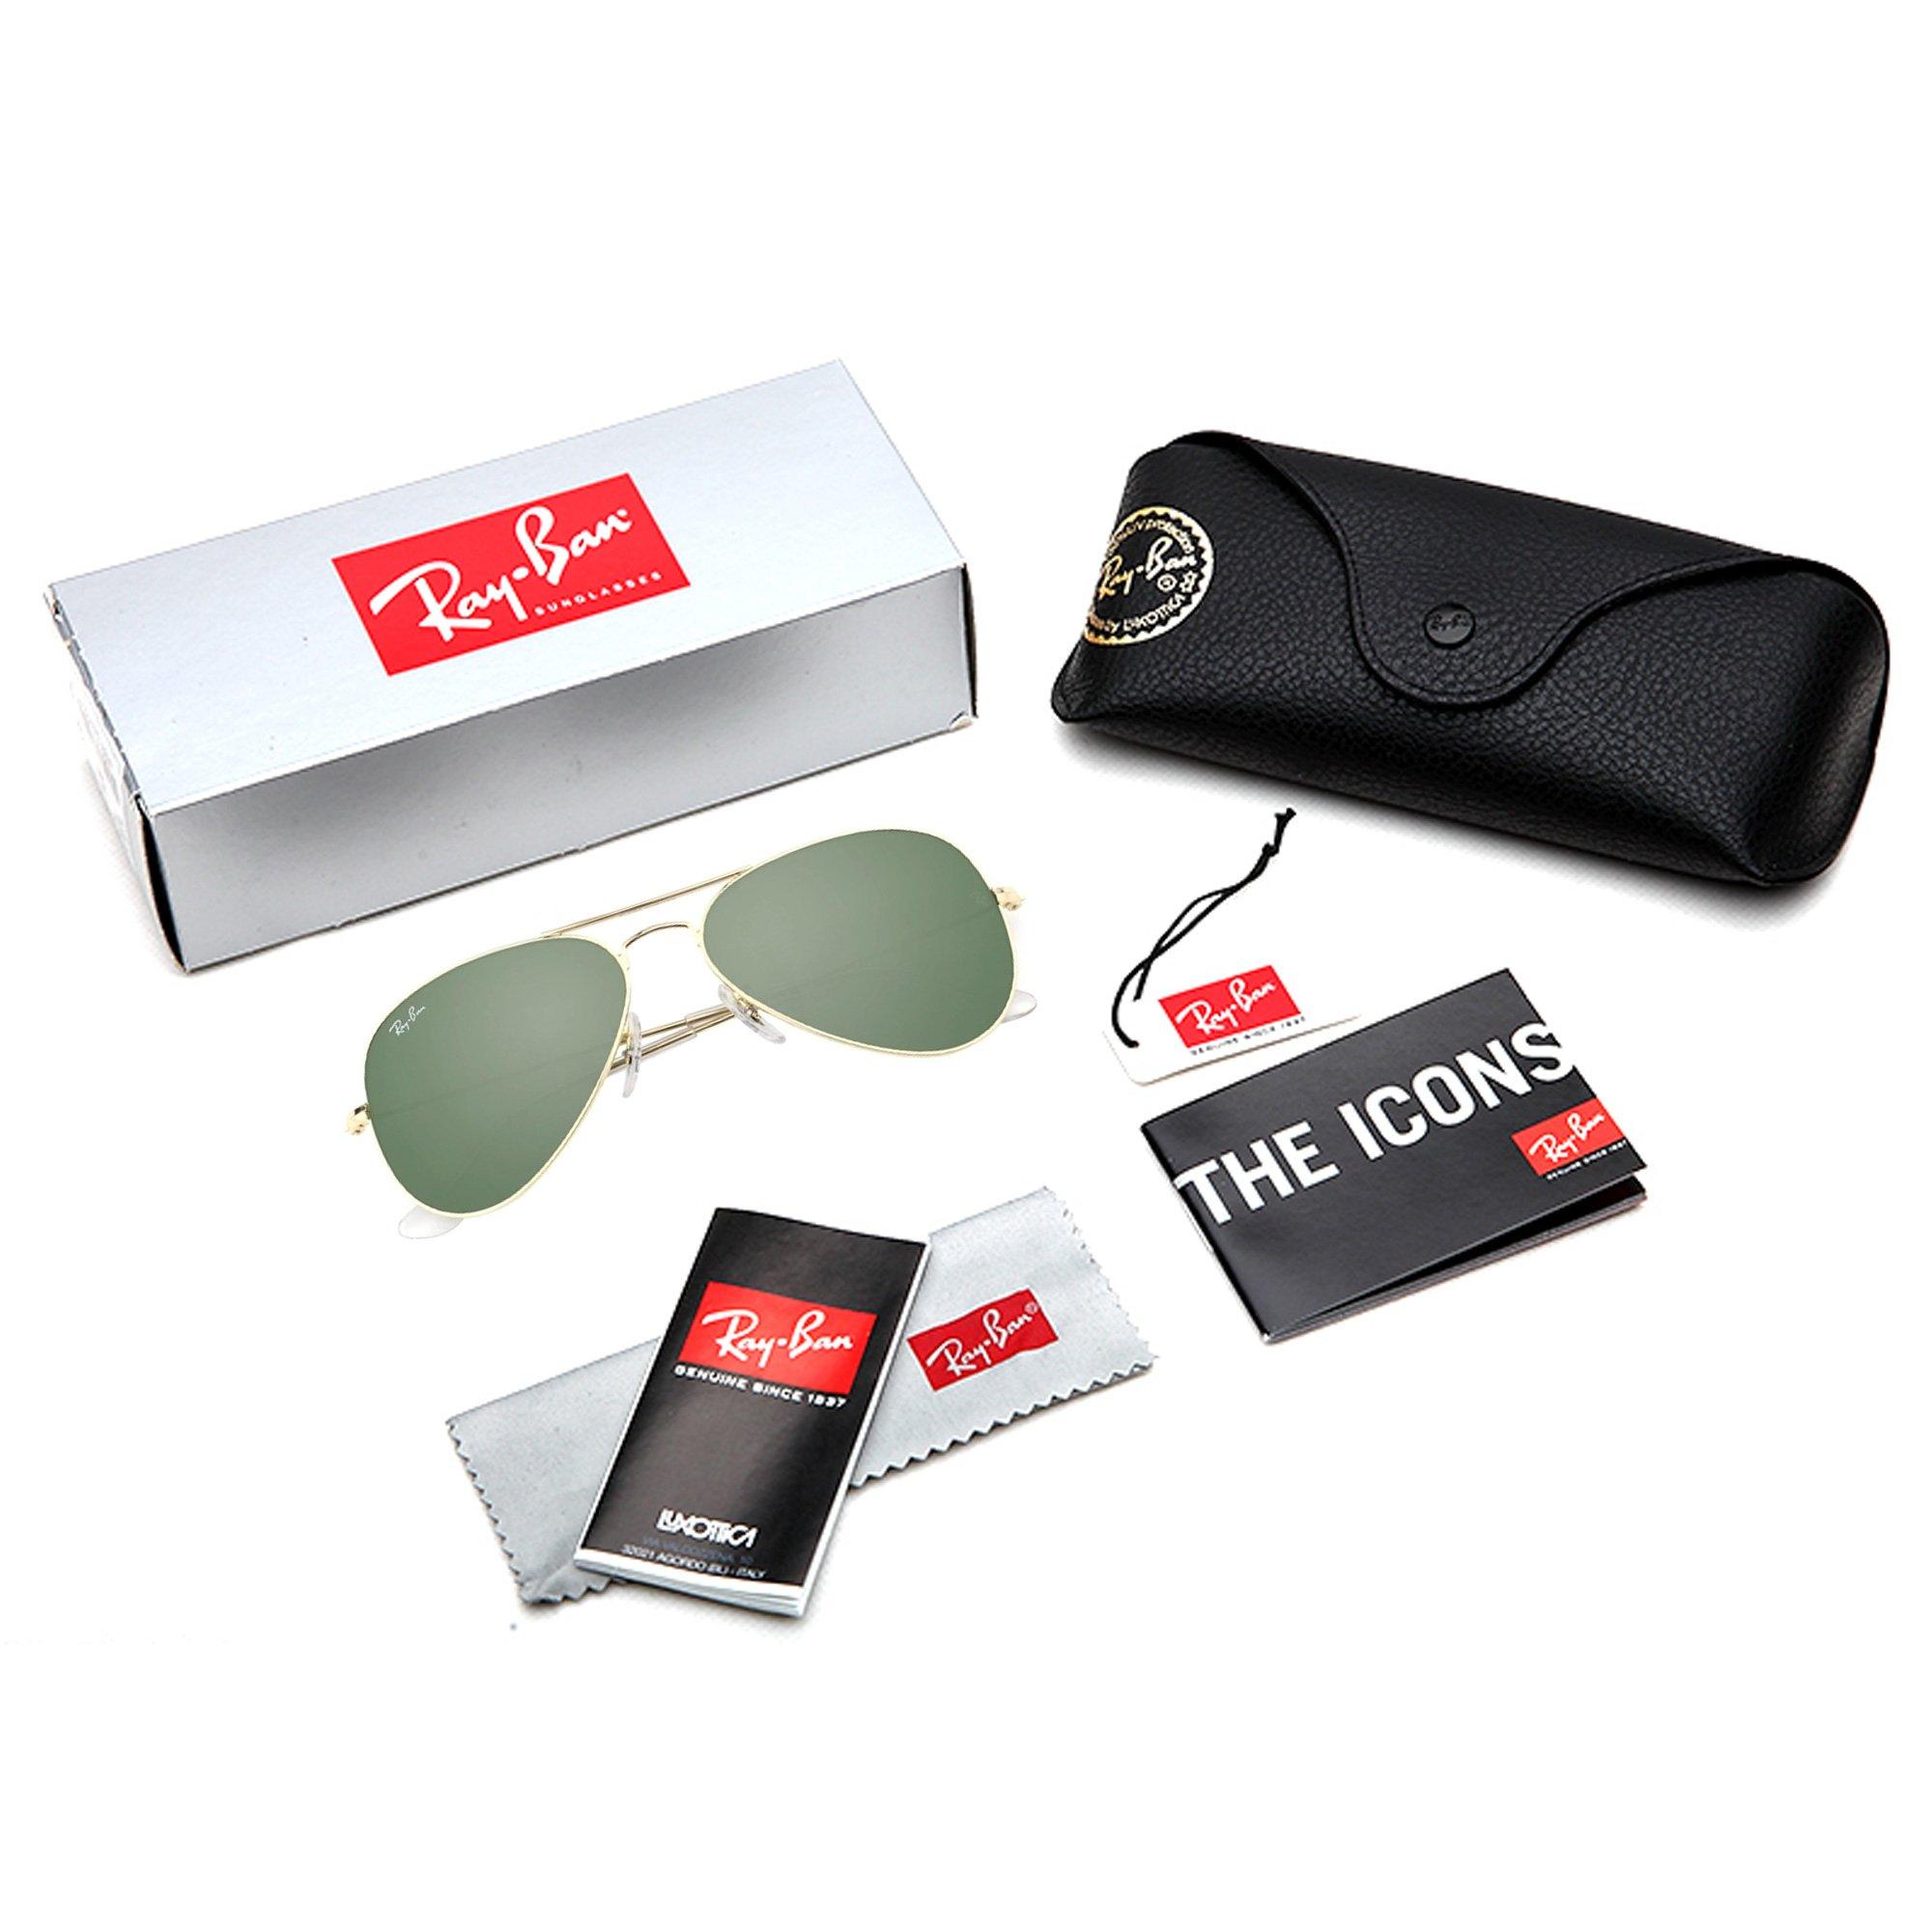 829f7ce6bb5 Ray-Ban Men s Aviator 3025 Sunglasses Gold Frame Green G-15xlt Lens- 55mm -  RB3025-W3234   Fishing Apparel   Sports   Outdoors - tibs